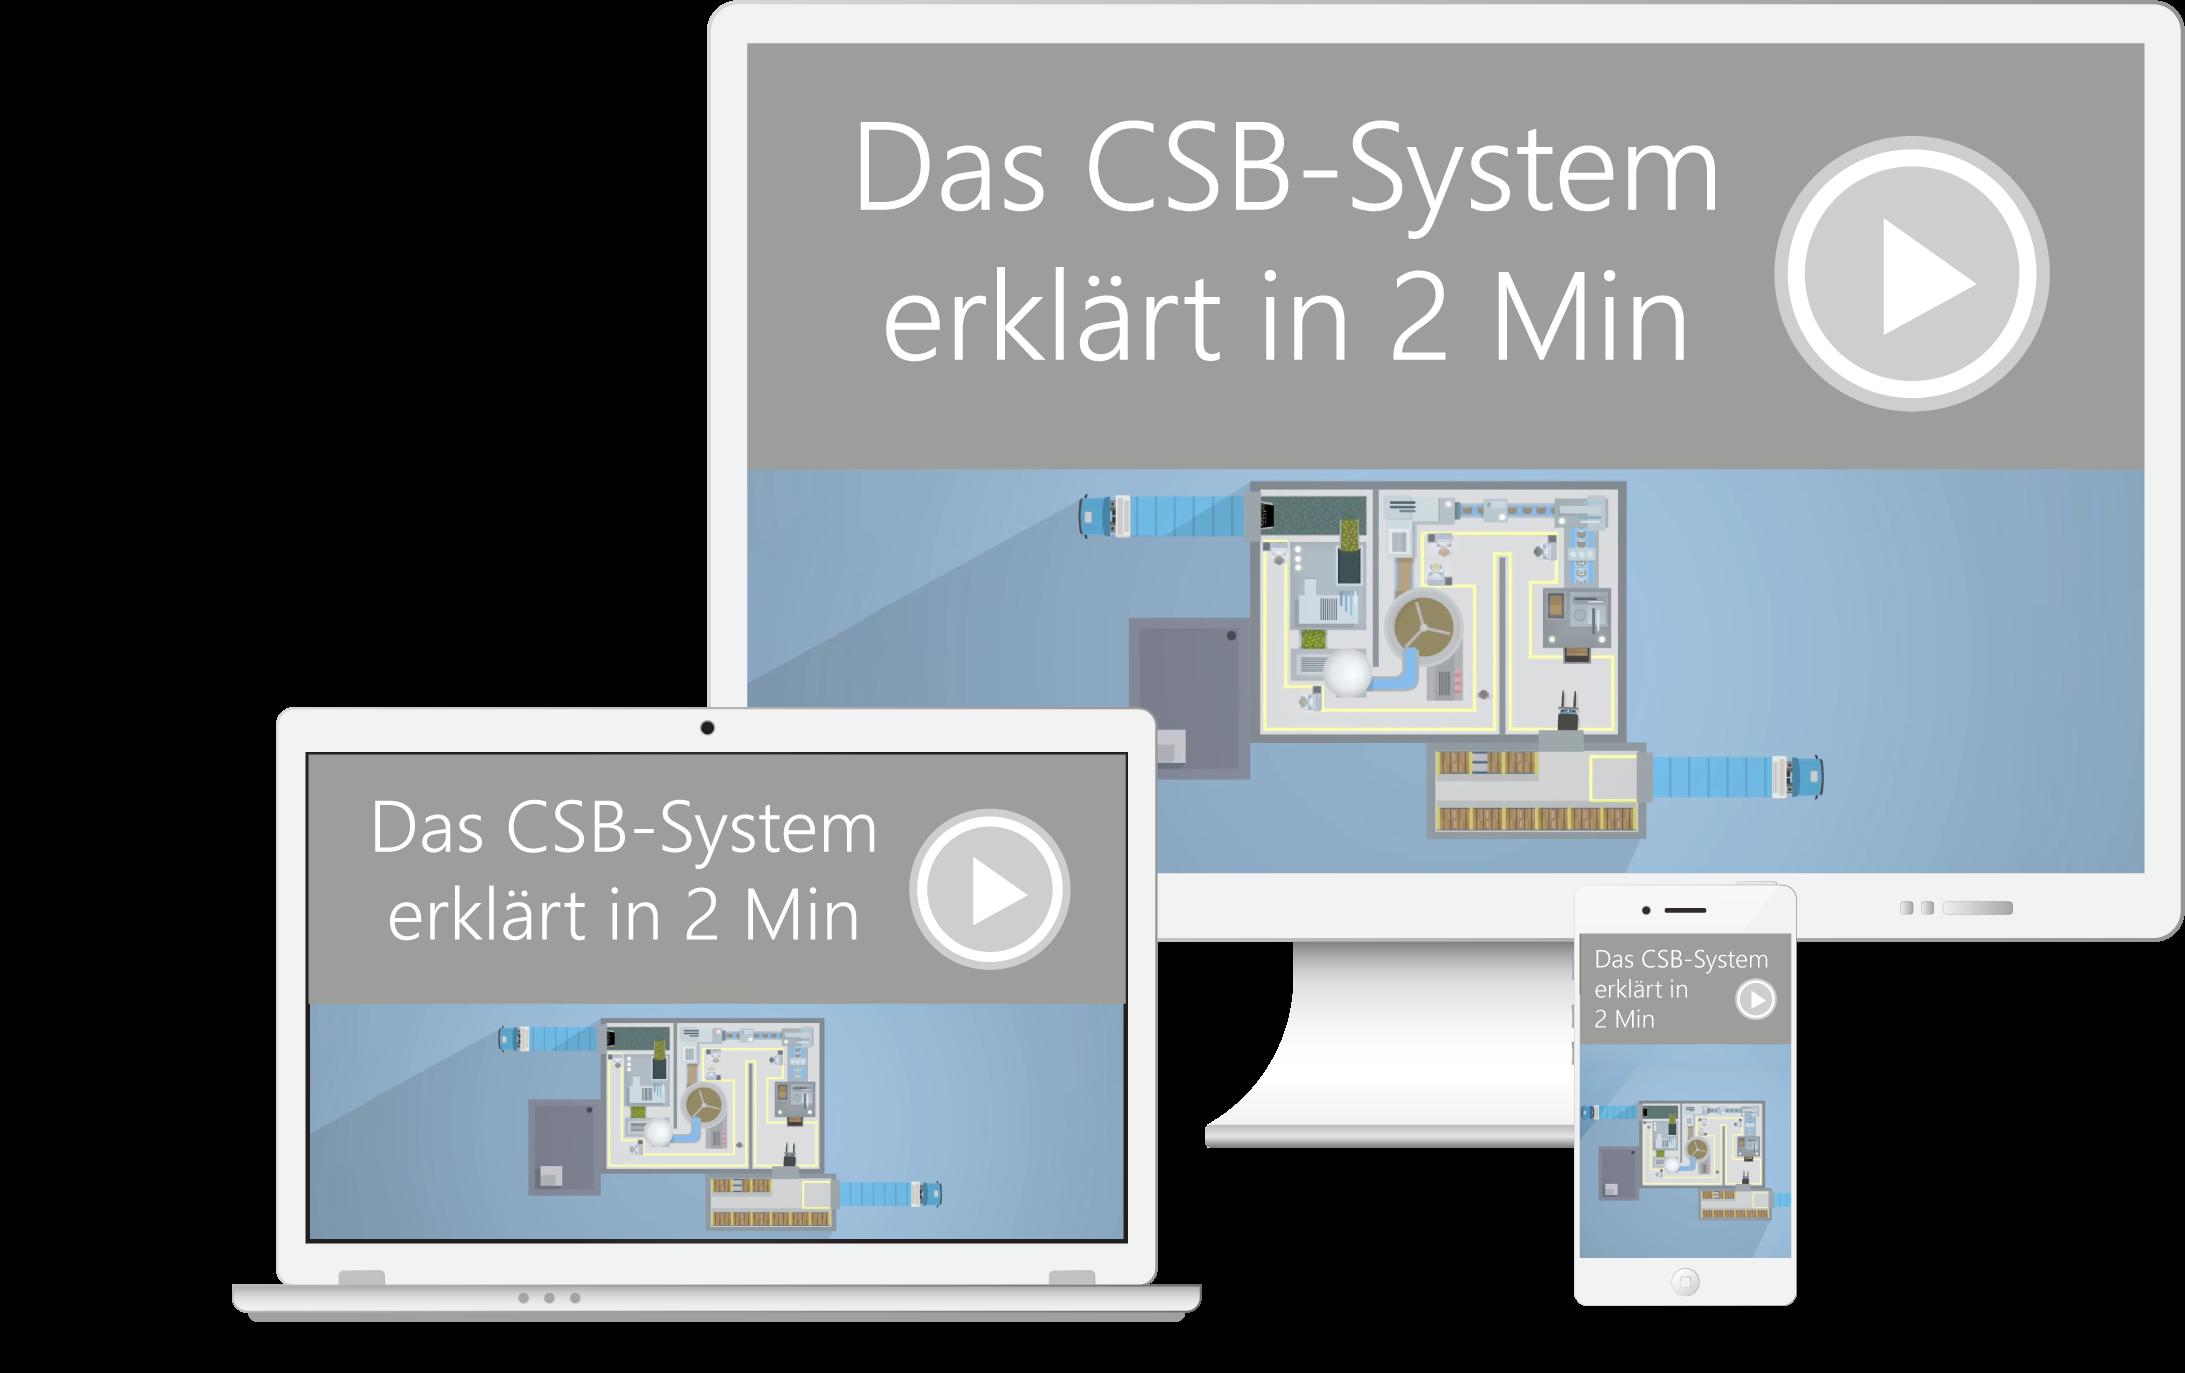 Softwarelösungen_Video_Monitore-18-18.png